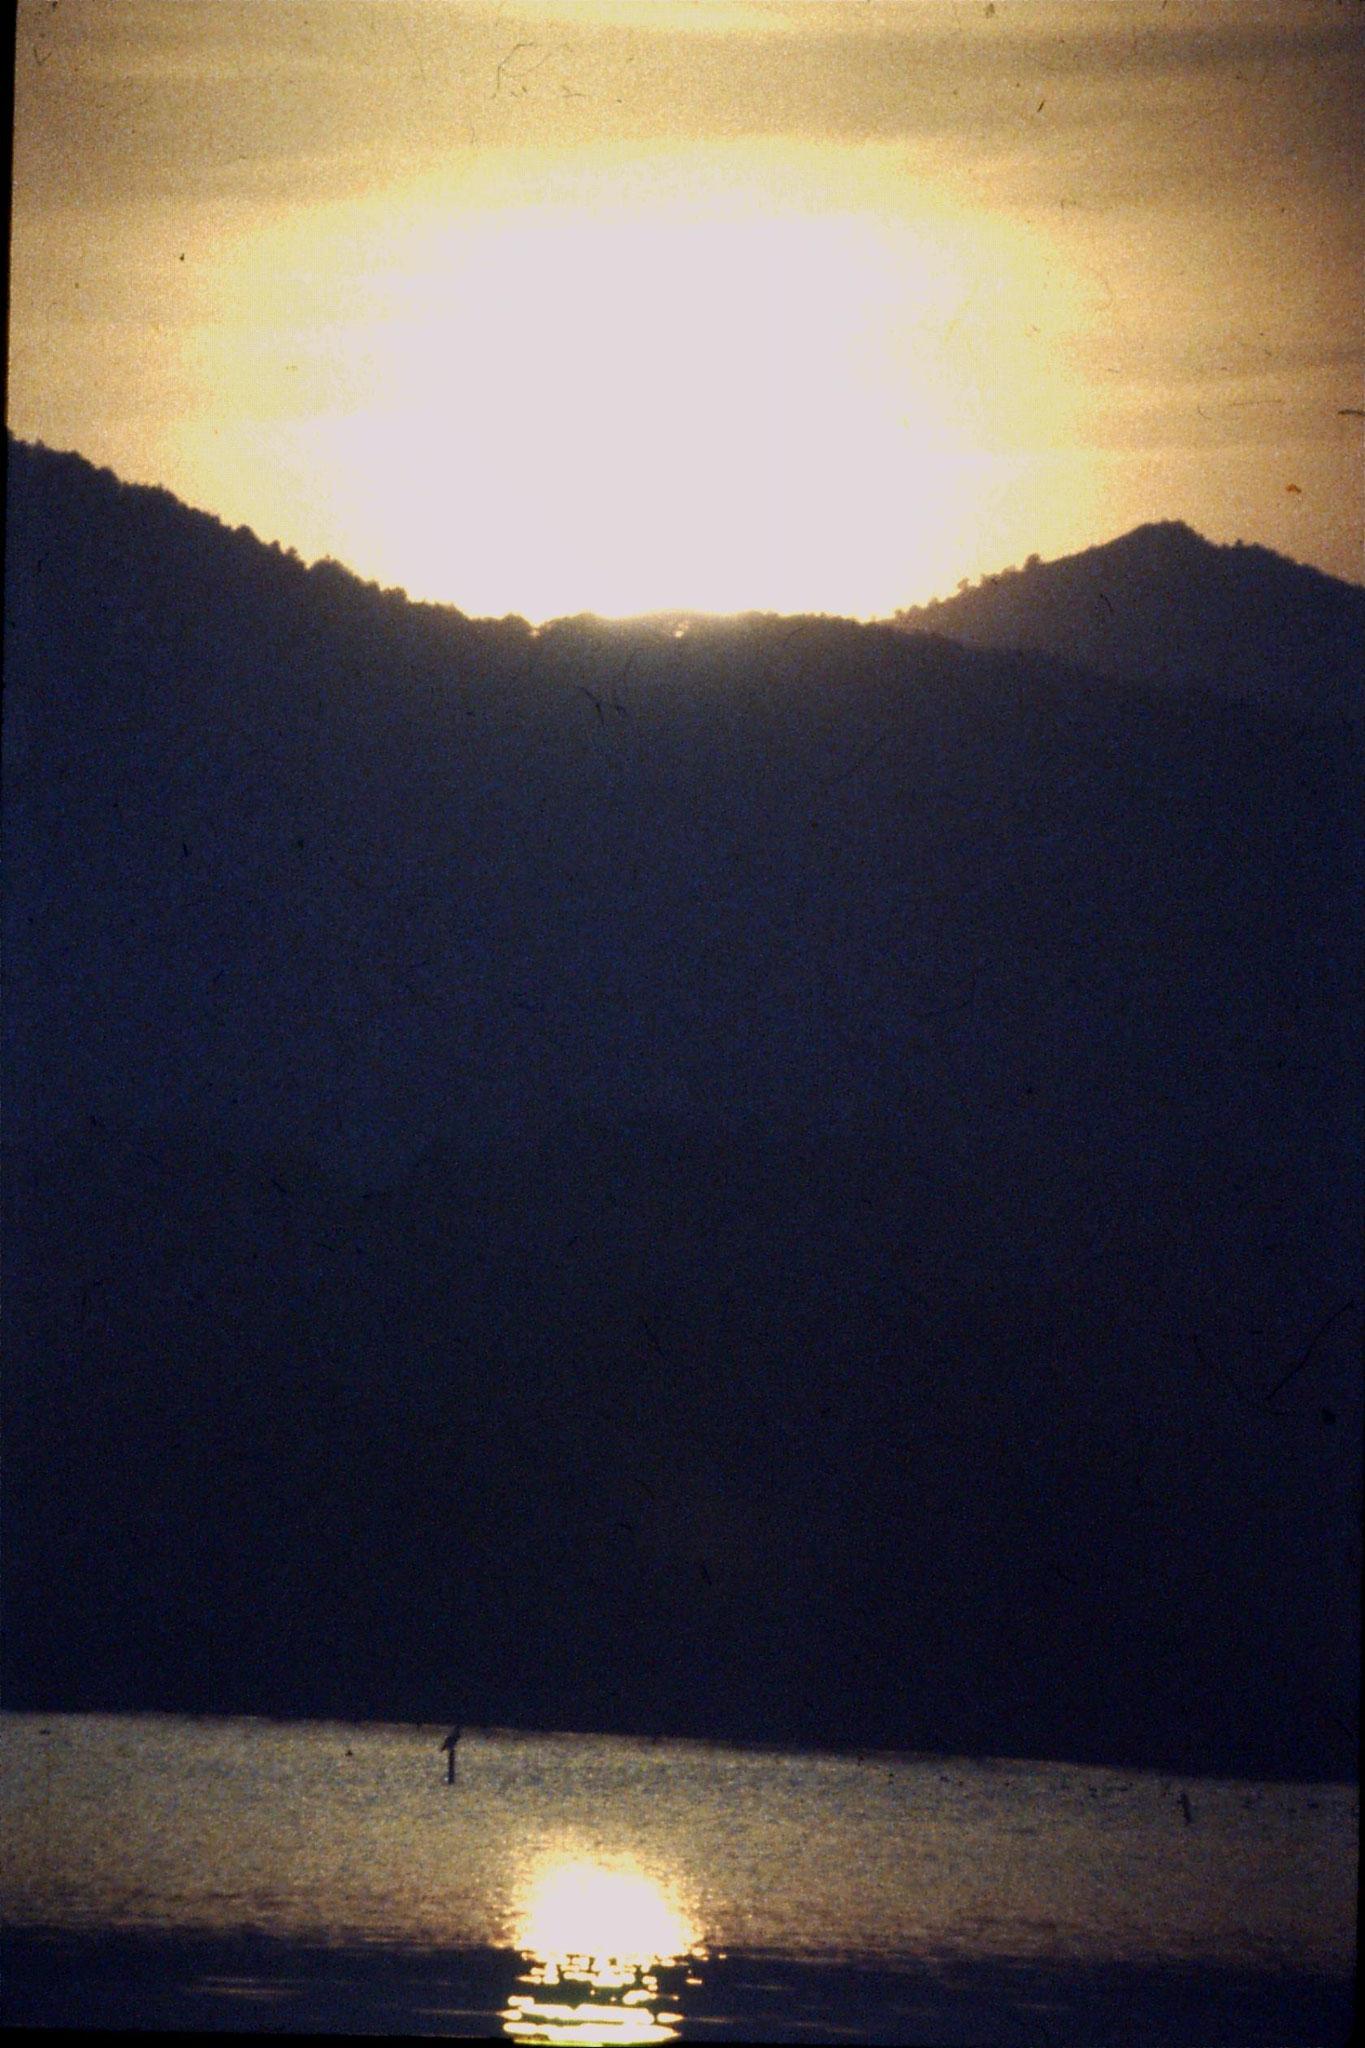 26/3/1989: 29:  Xili Lake